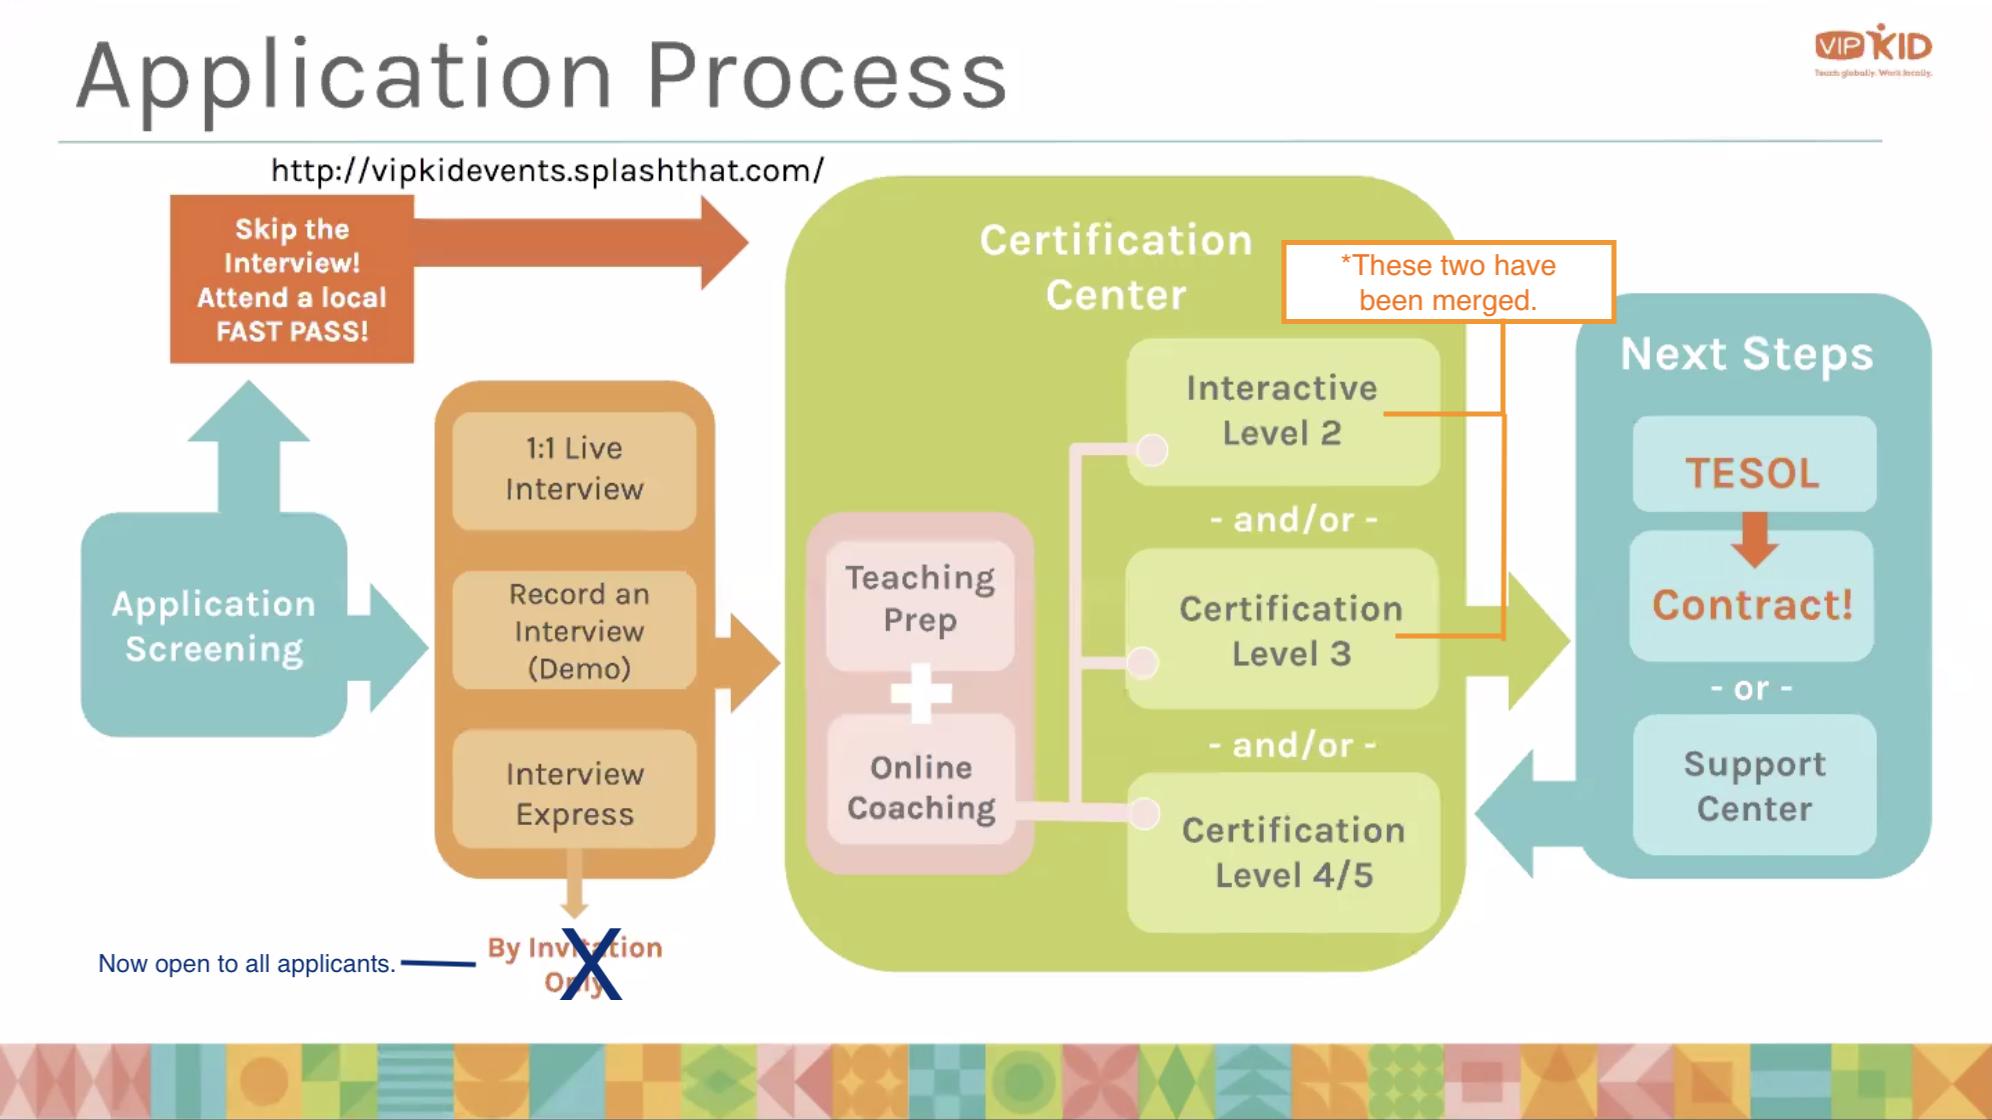 VIPKID Application Process Flow Chart.png